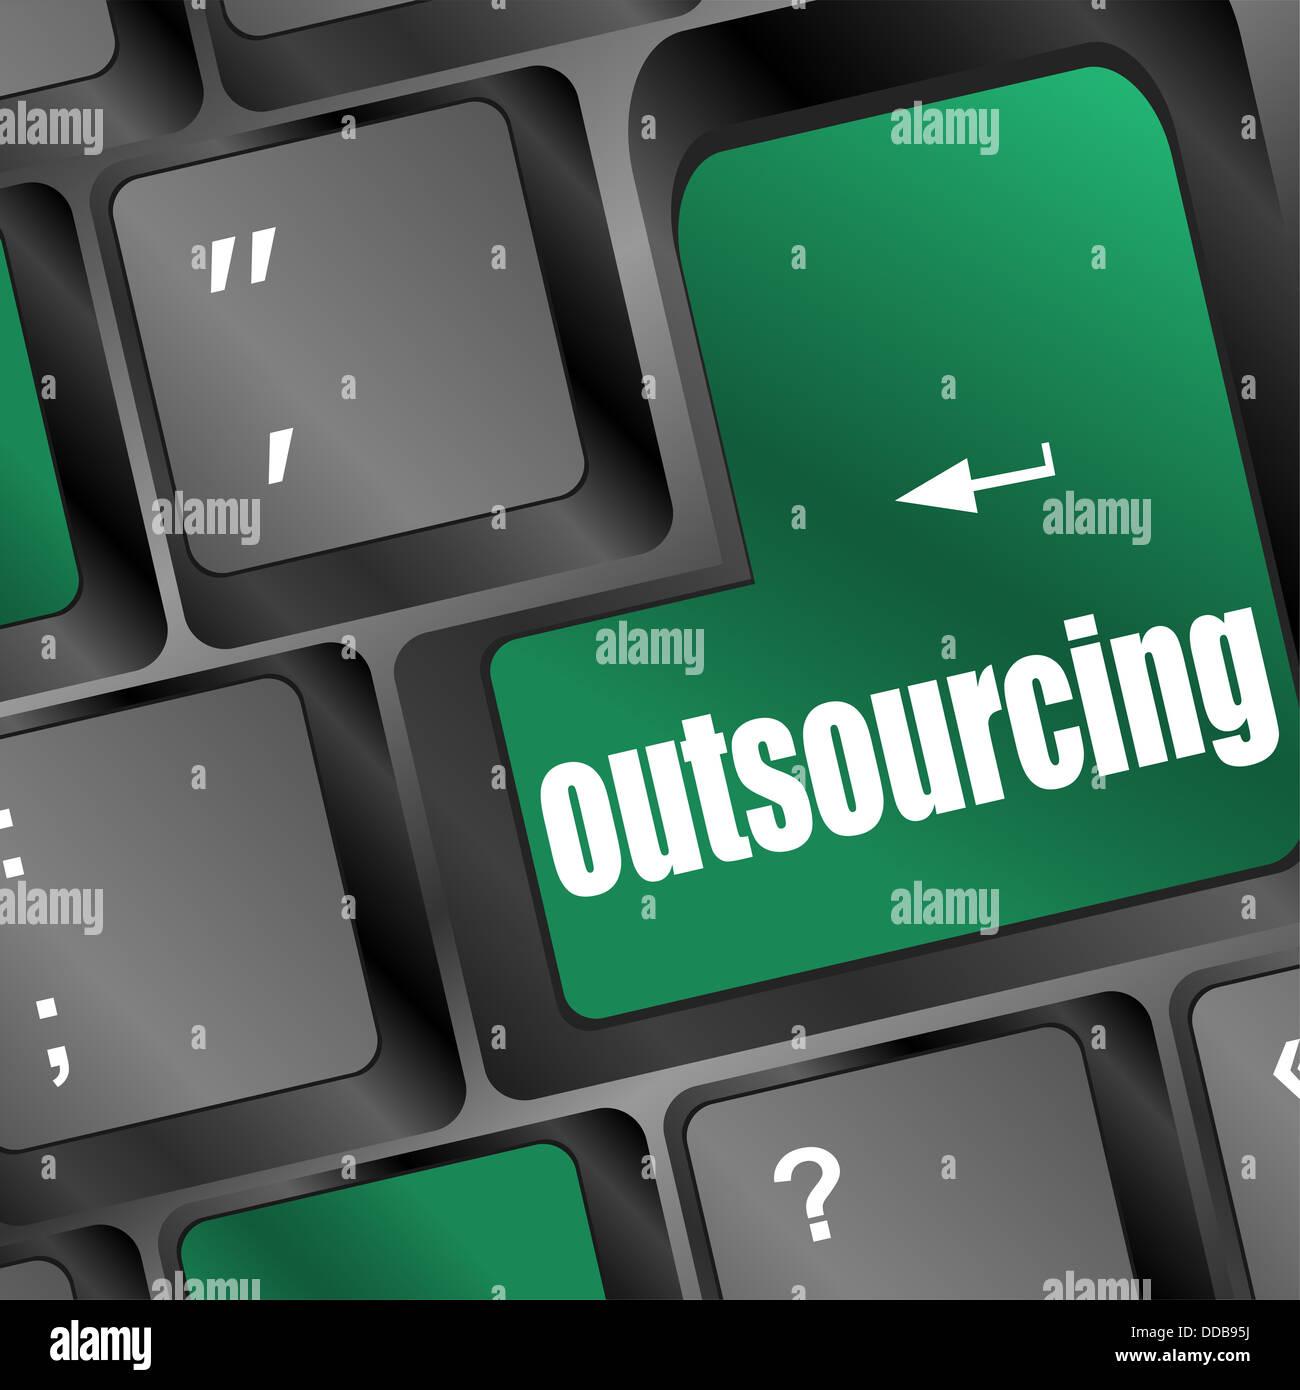 Outsourcing key on laptop keyboard - Stock Image